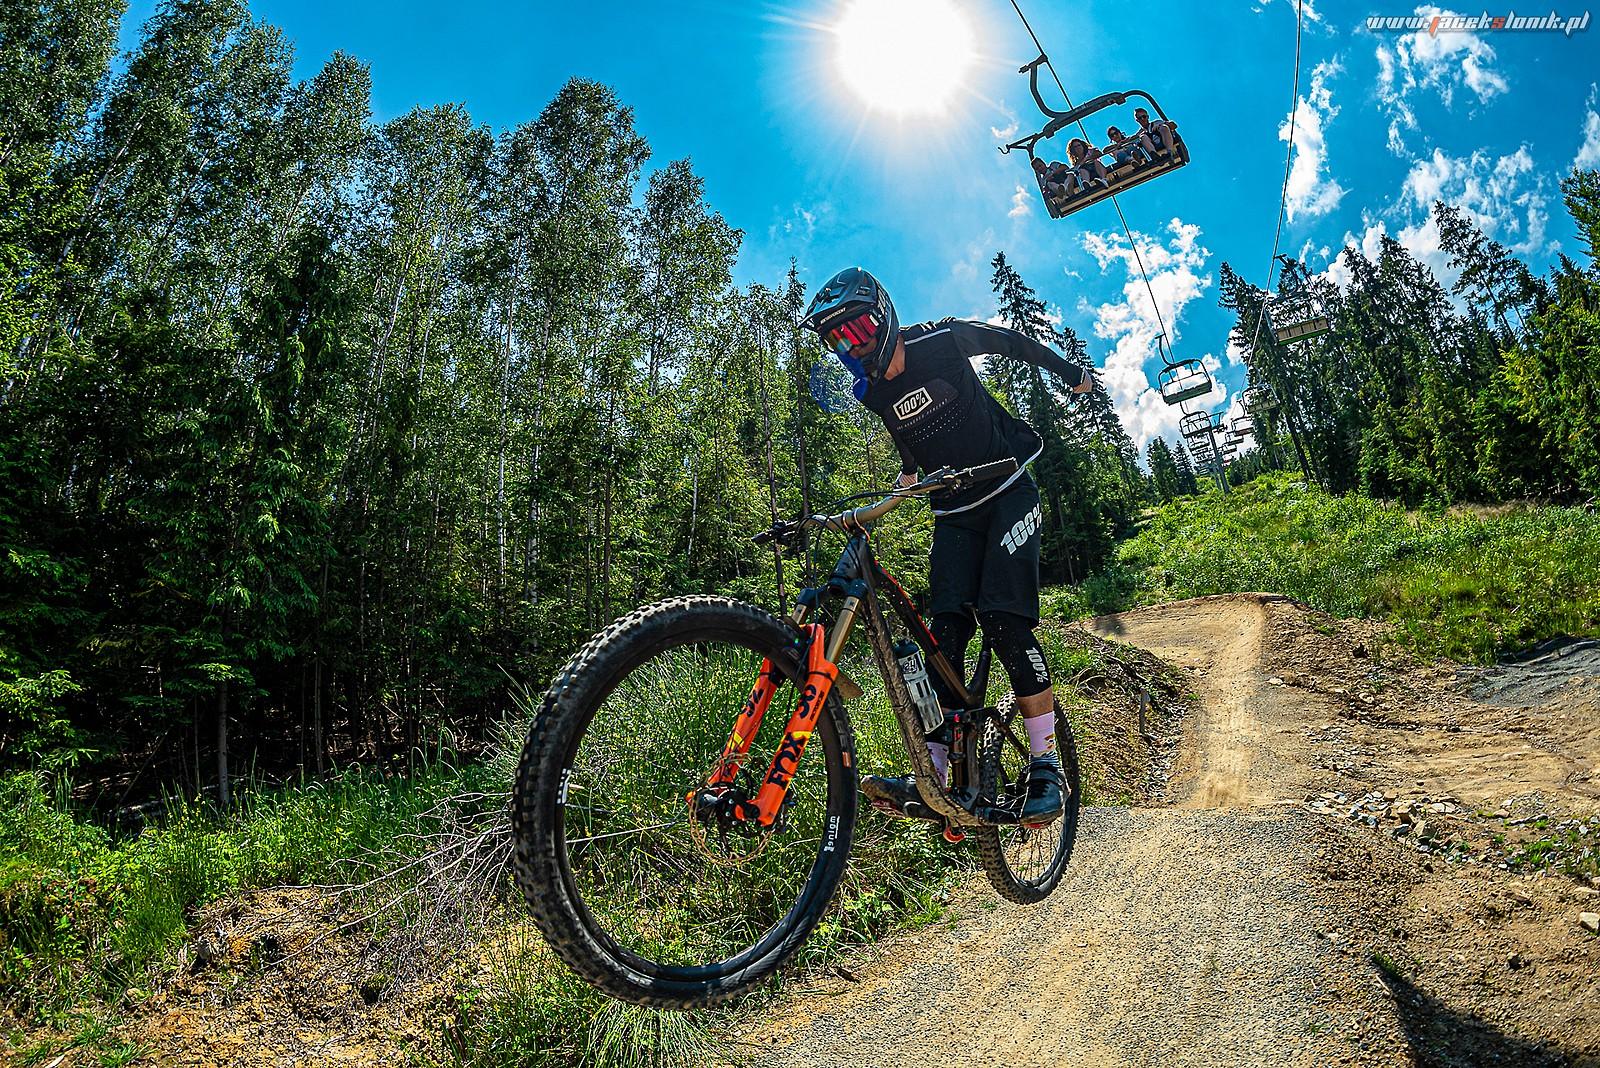 Kriss on Skolnity Gravity Park - JacekSlonik - Mountain Biking Pictures - Vital MTB